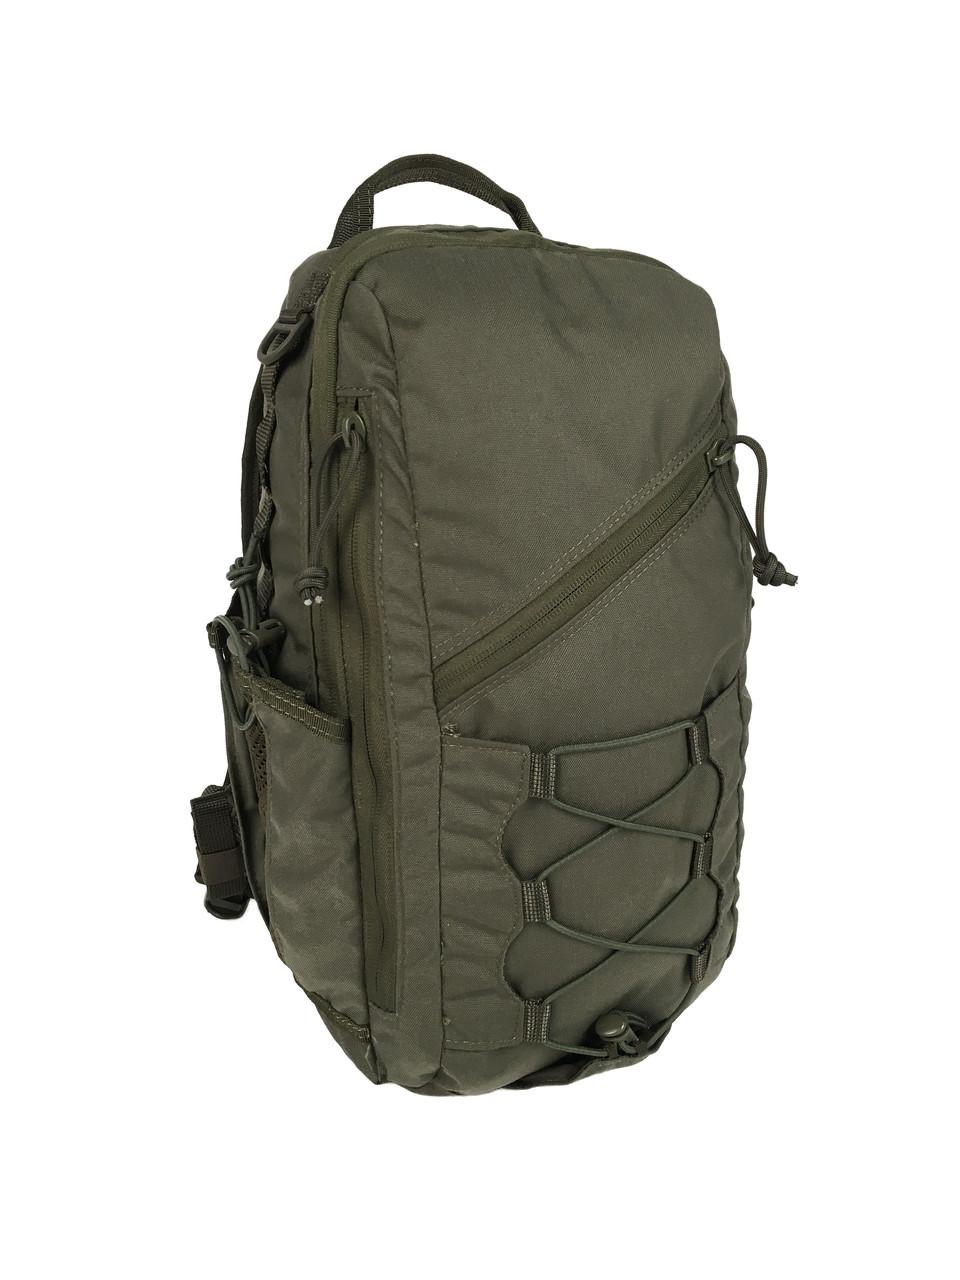 Рюкзак М23 Tot-2 Ranger green